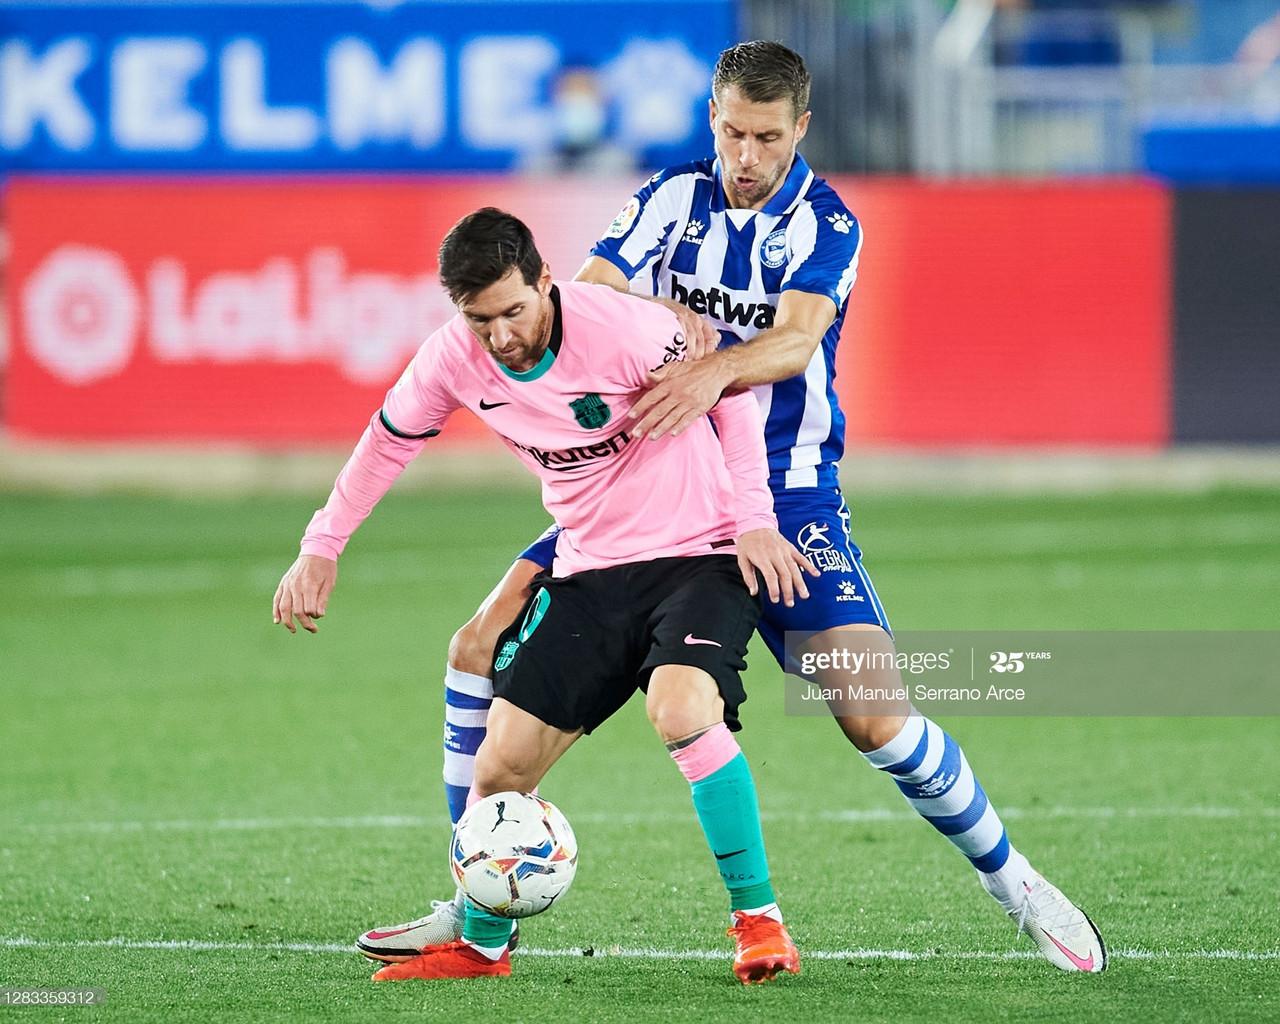 Florian Lejeune leaves Newcastle United to join La Liga club